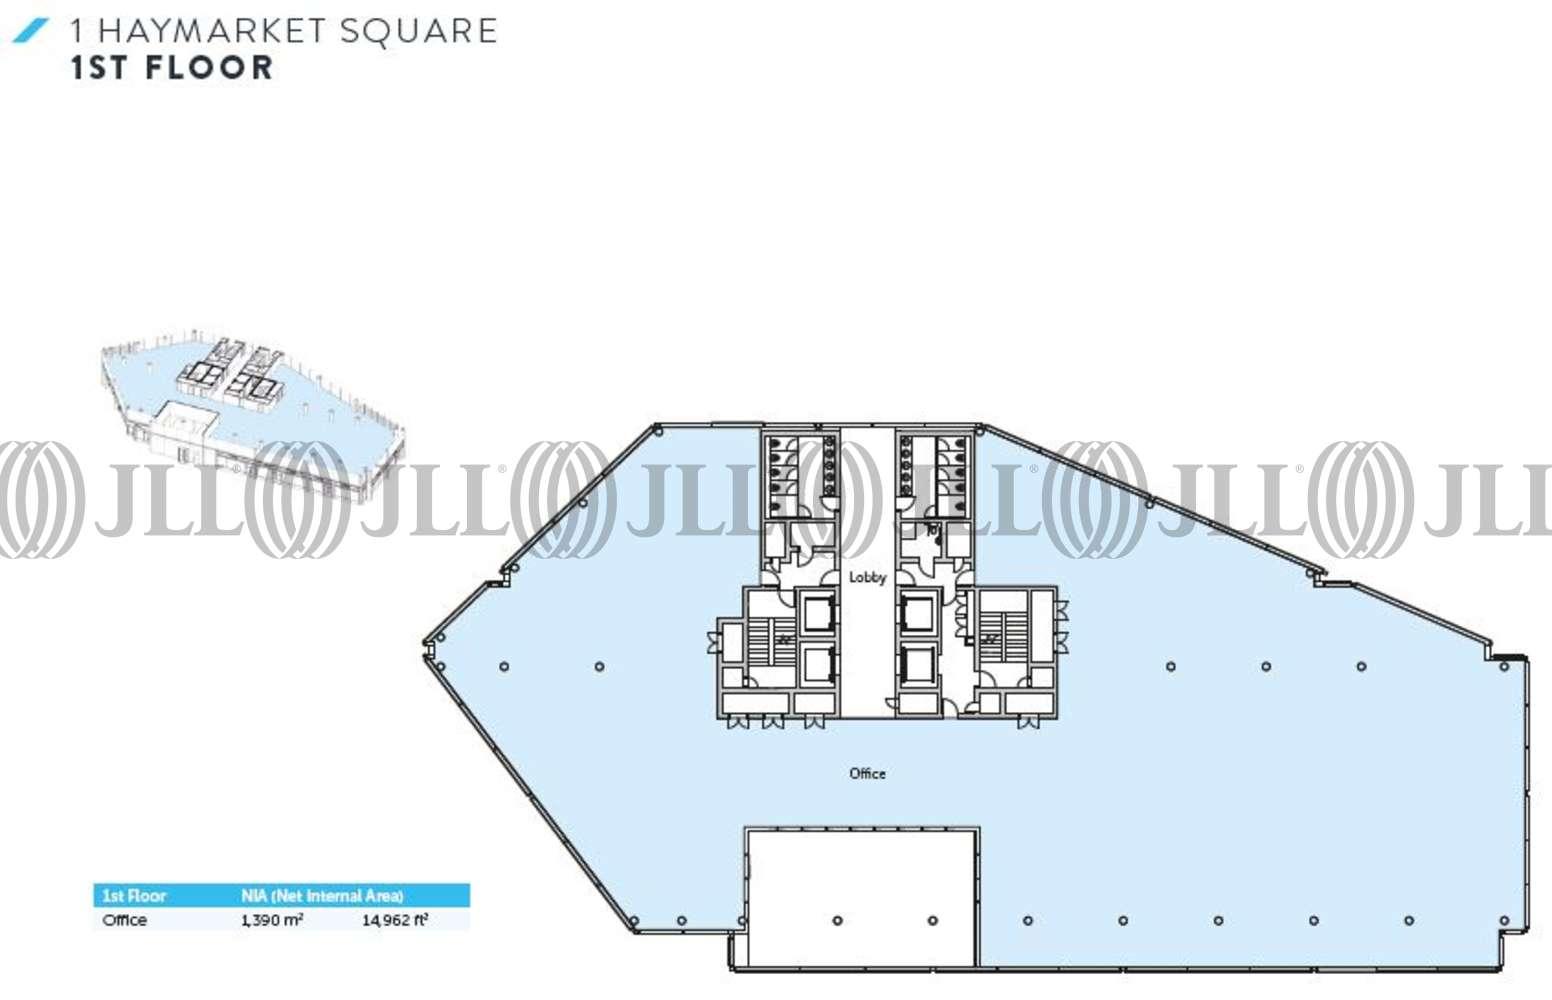 Office Edinburgh, EH3 8DT - 1 Haymarket Square